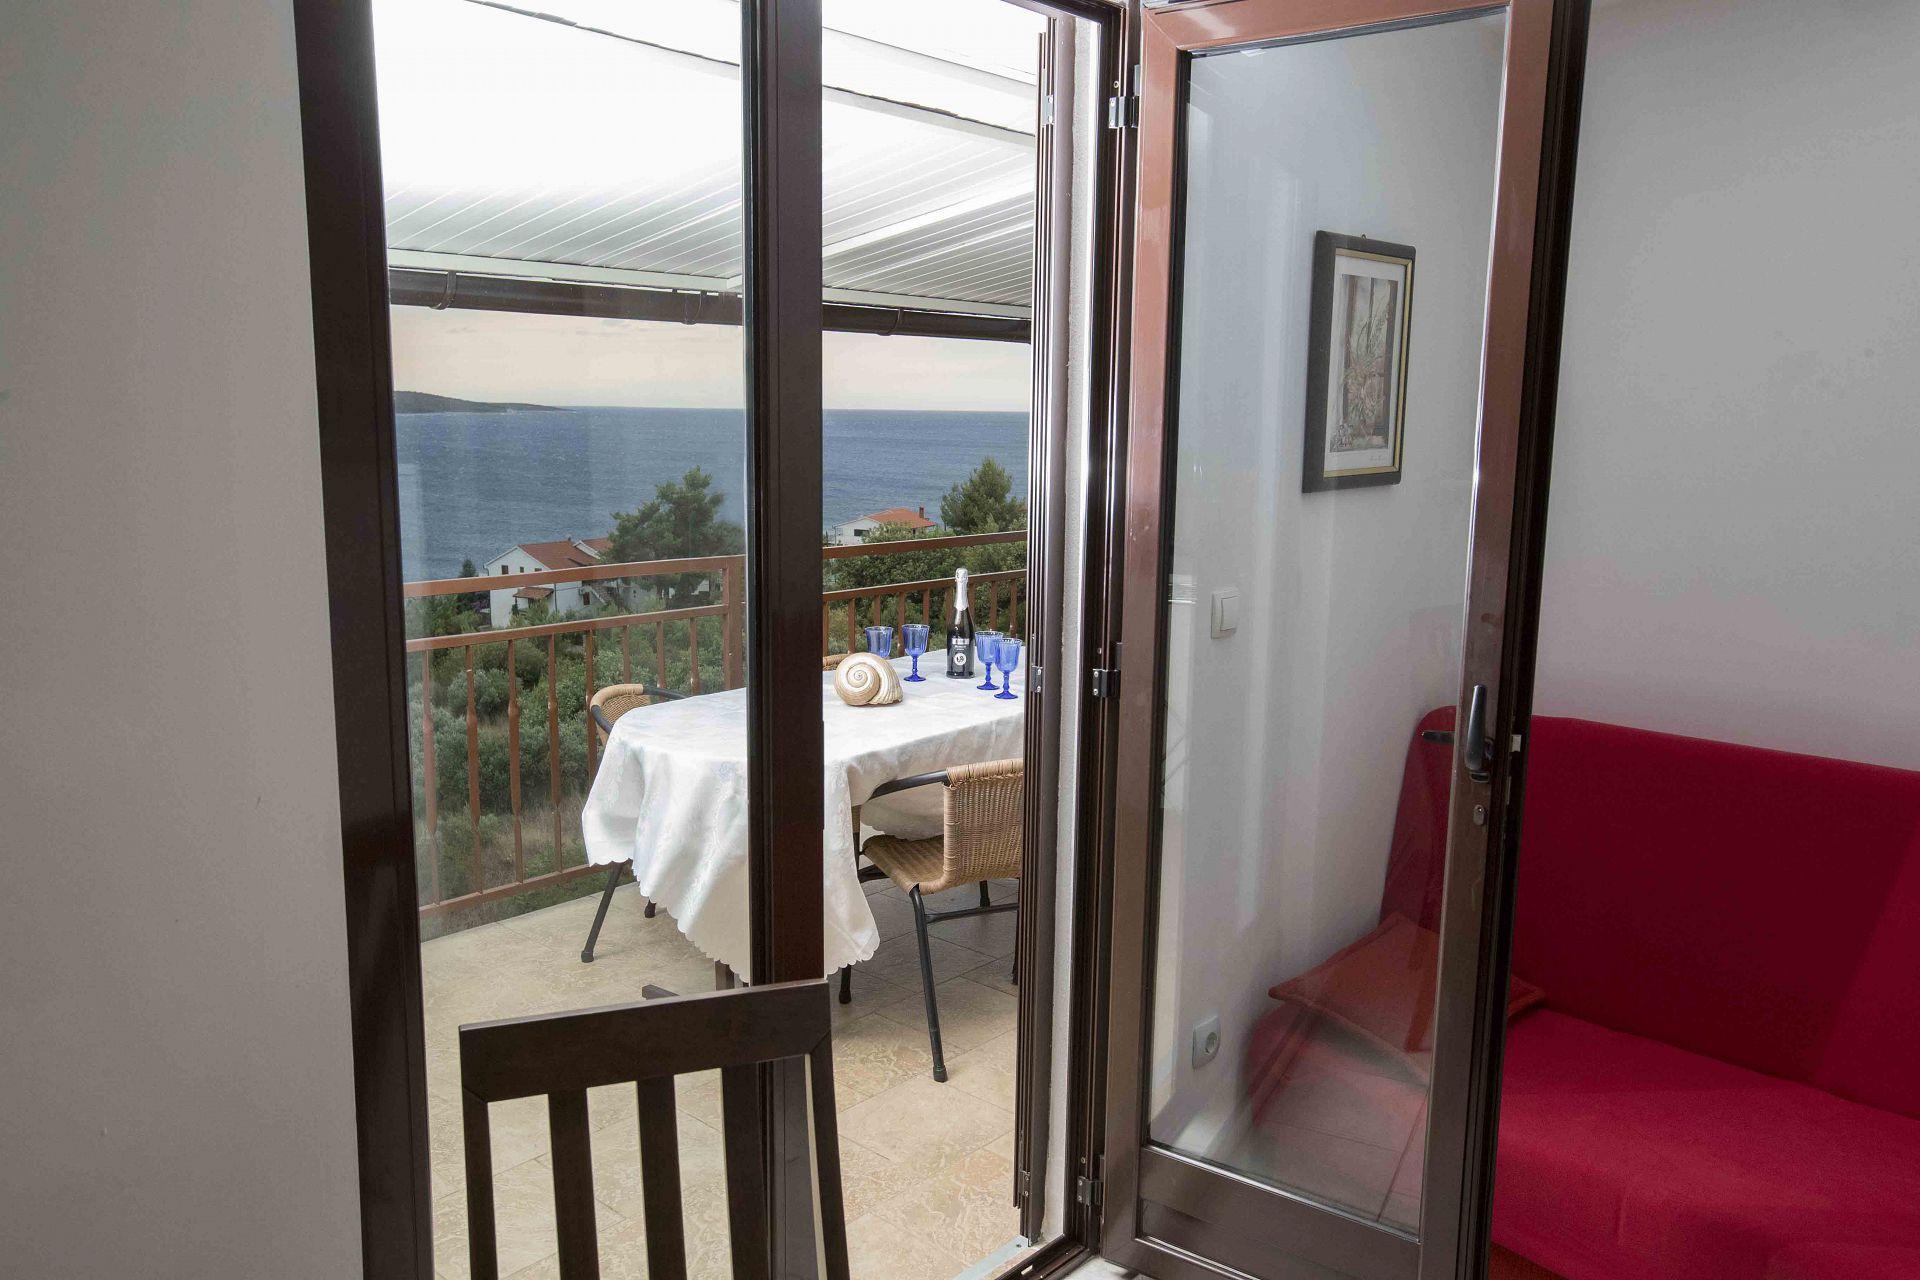 00603ZAVA - Zavala - Appartementen Kroatië - Mario(4+1): terras